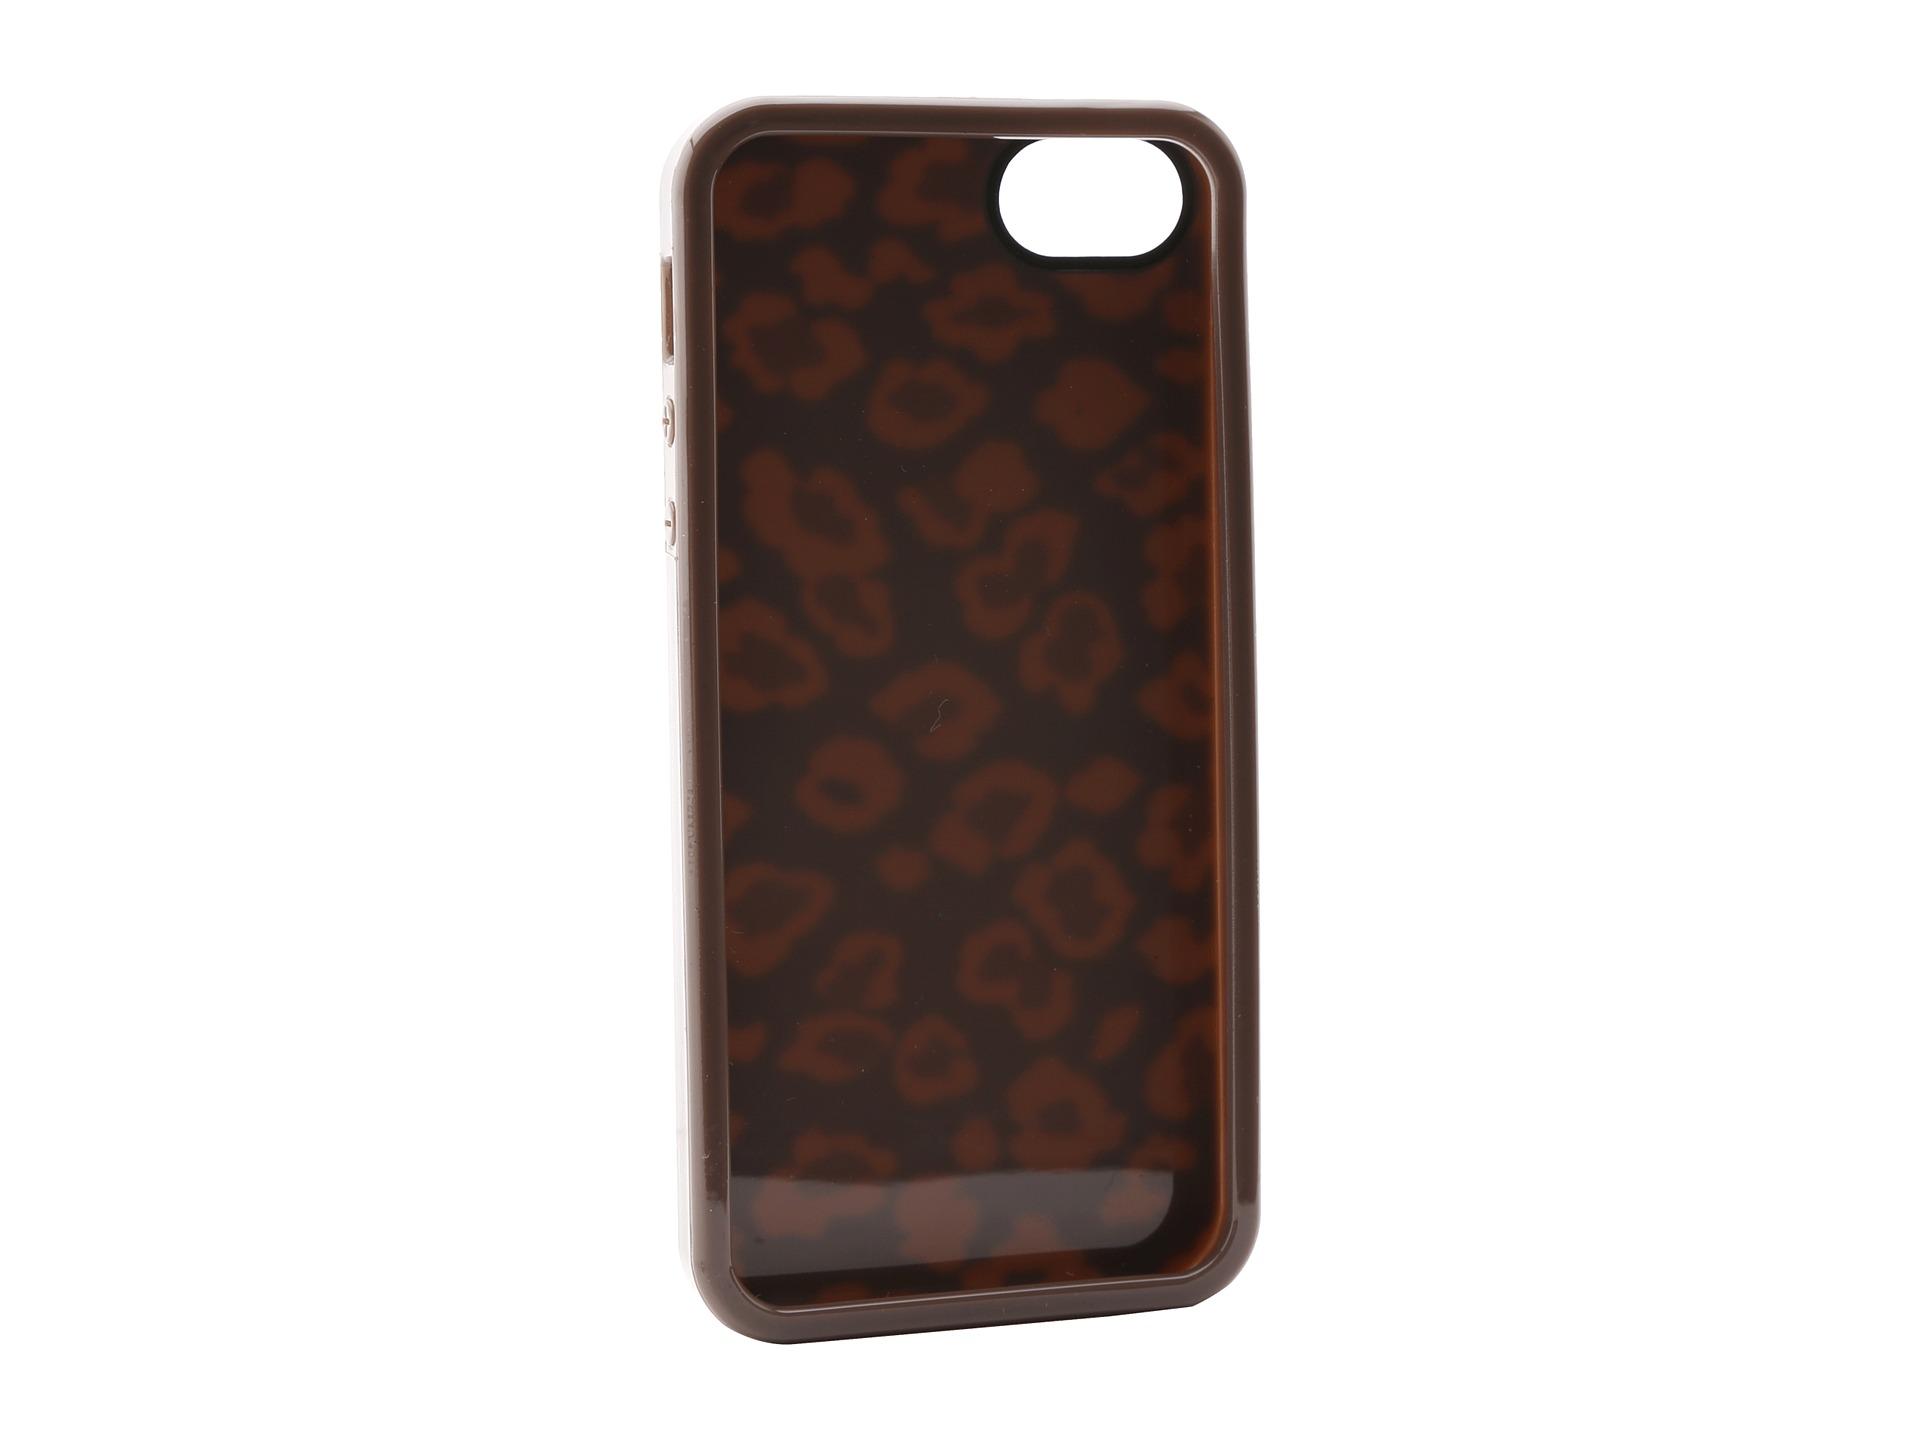 marc by marc jacobs sasha leopard phone case for iphone 5. Black Bedroom Furniture Sets. Home Design Ideas